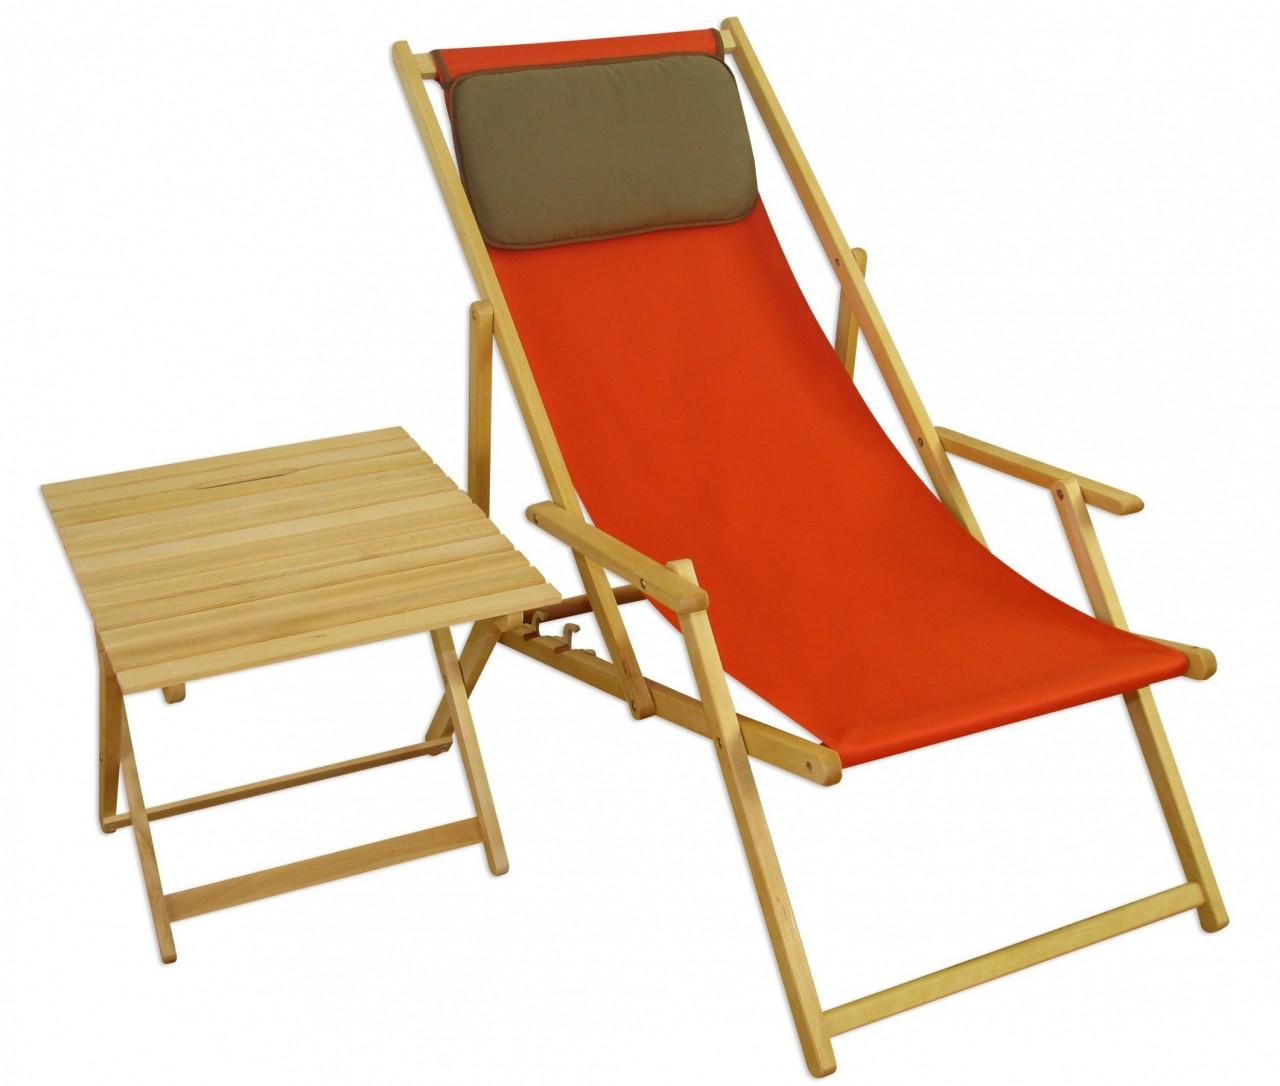 Full Size of Liegestuhl Garten Terracotta Gartenliege Tisch Kissen Deckchair Holz Loungemöbel Lounge Sessel Wassertank Trennwand Whirlpool Aufblasbar Mastleuchten Garten Liegestuhl Garten